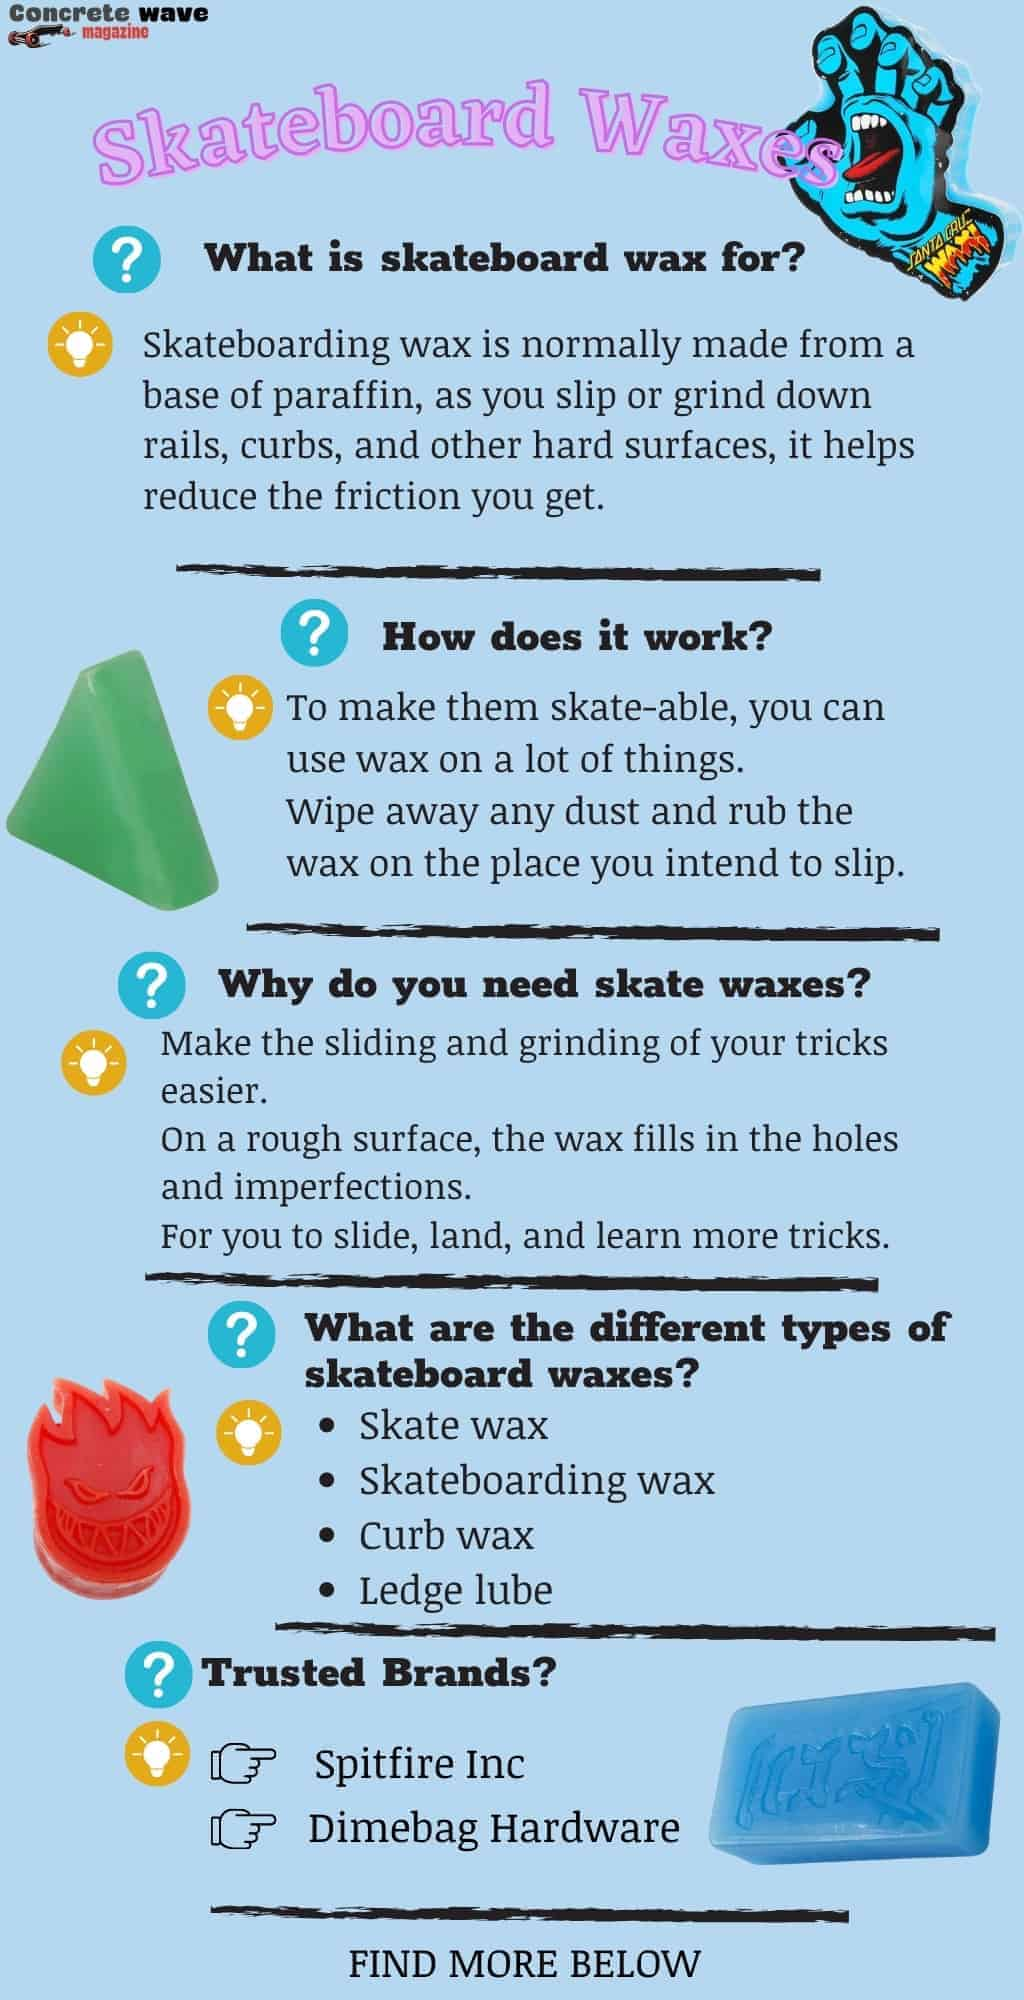 skate-board-wax